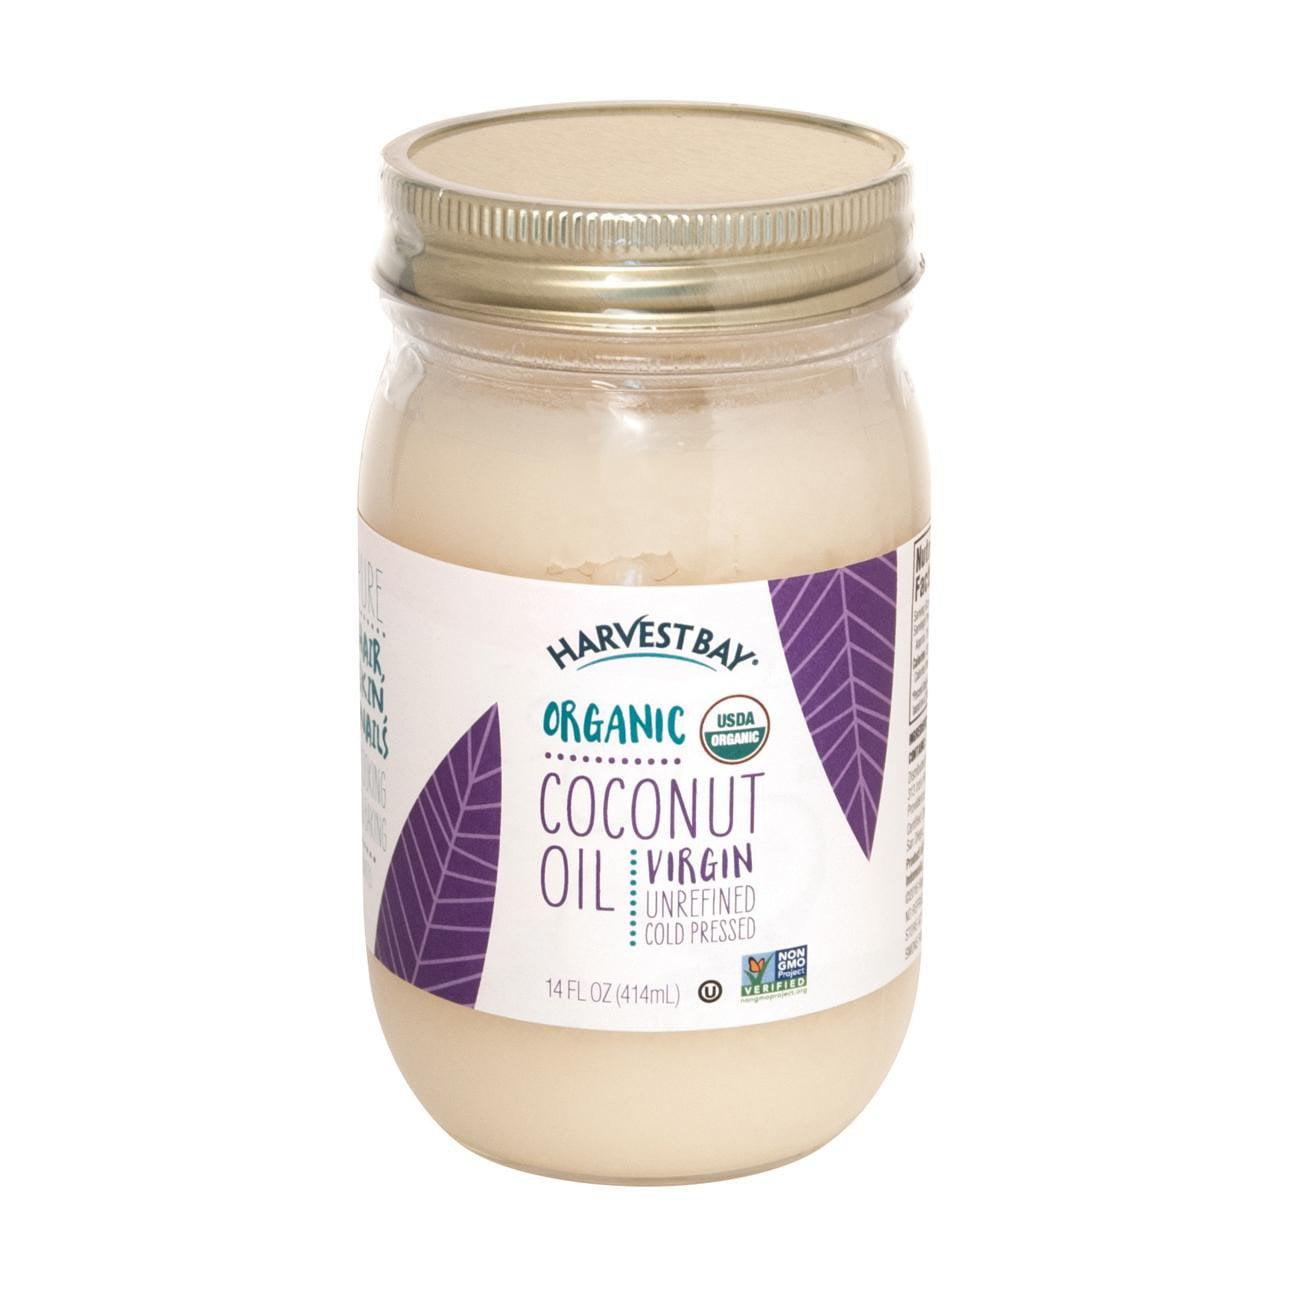 Harvest Bay Organic Coconut Oil - Extra Virgin Unrefined ...